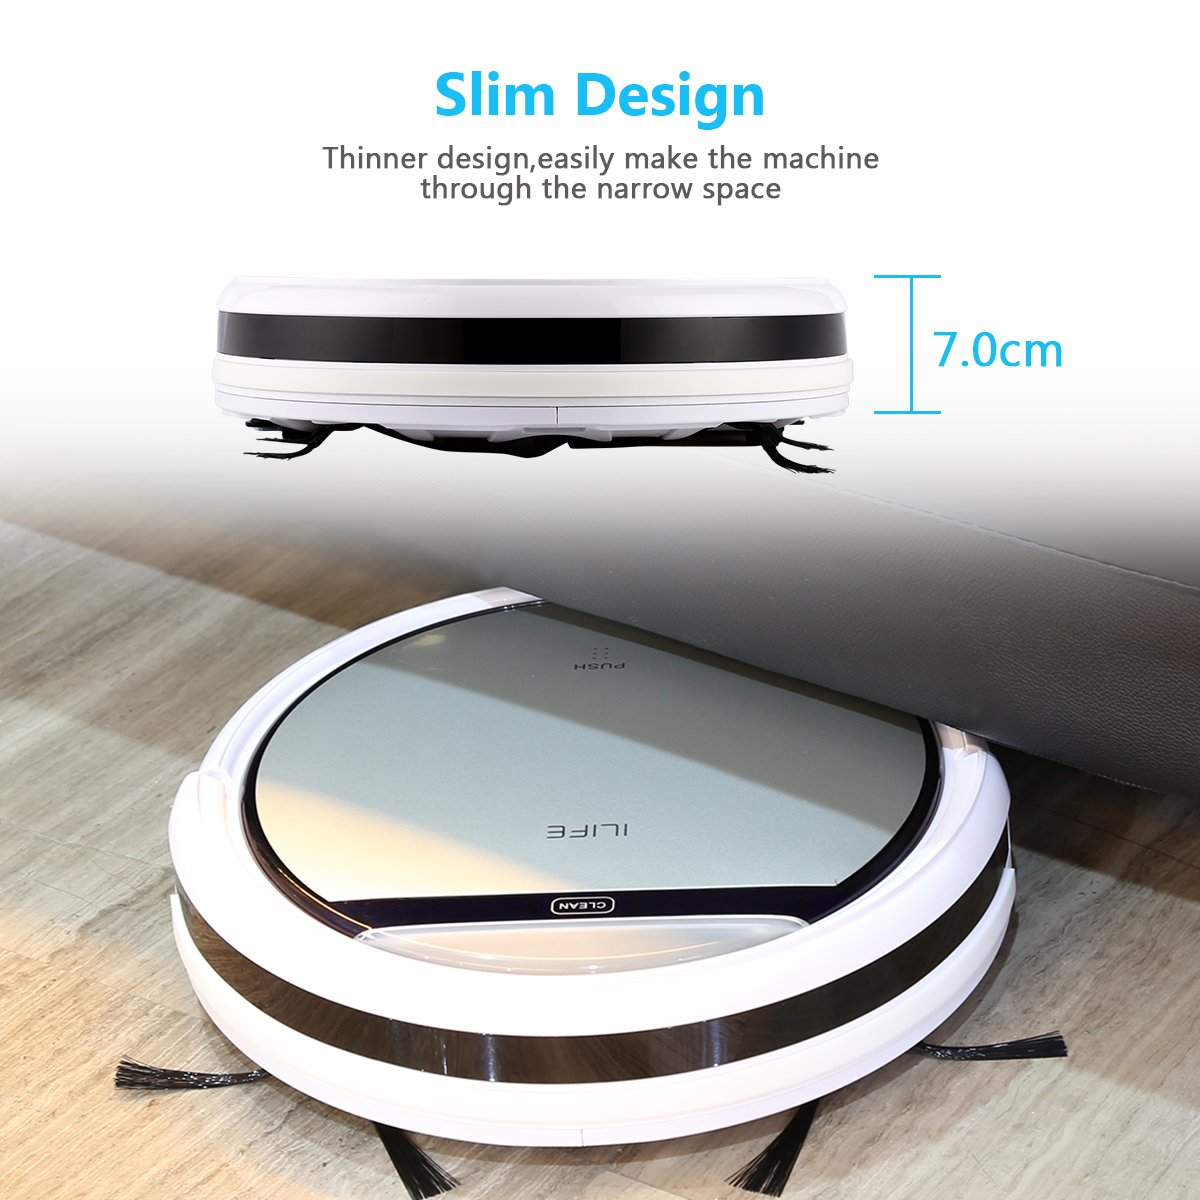 iLife V5 inteligente limpieza robótica Robot planta automática Aspirador Mopa polvo escoba: Amazon.es: Hogar